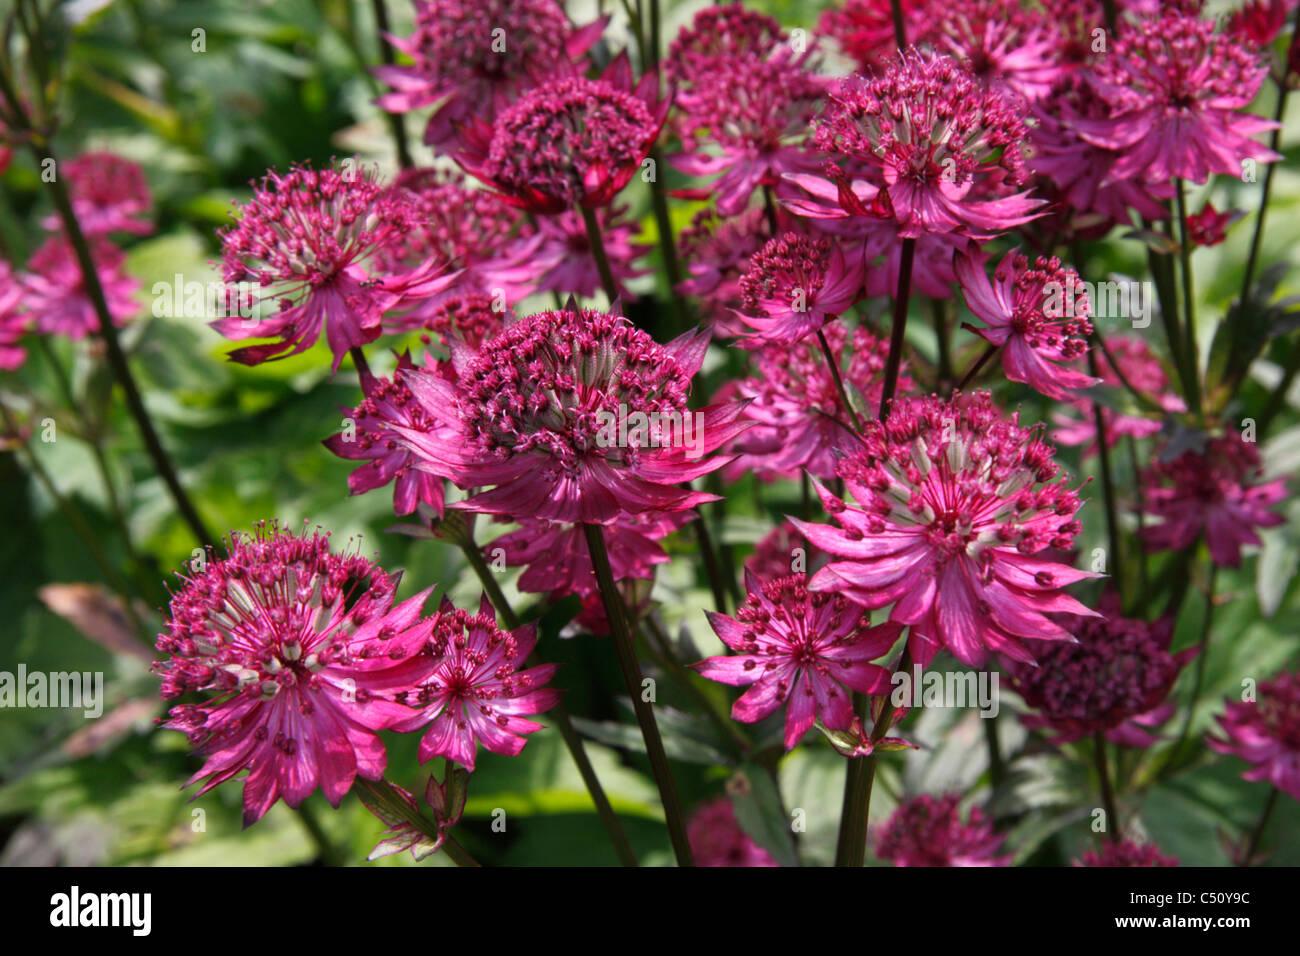 Red Flowers Of Garden Plant Astrantia Major Ruby Wedding